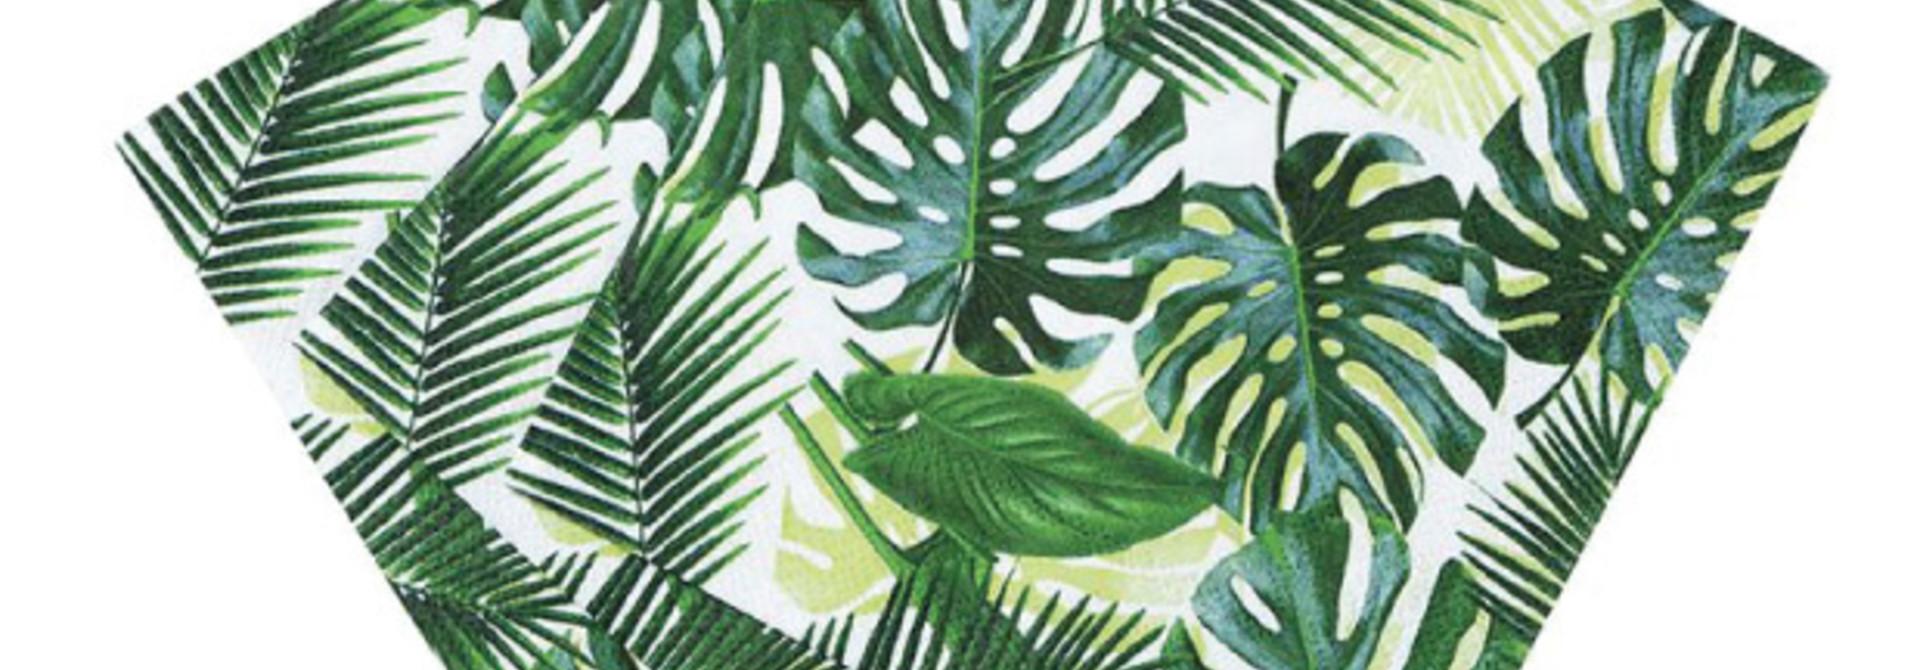 Servetten tropical fiesta (20 st) - Talking Tables